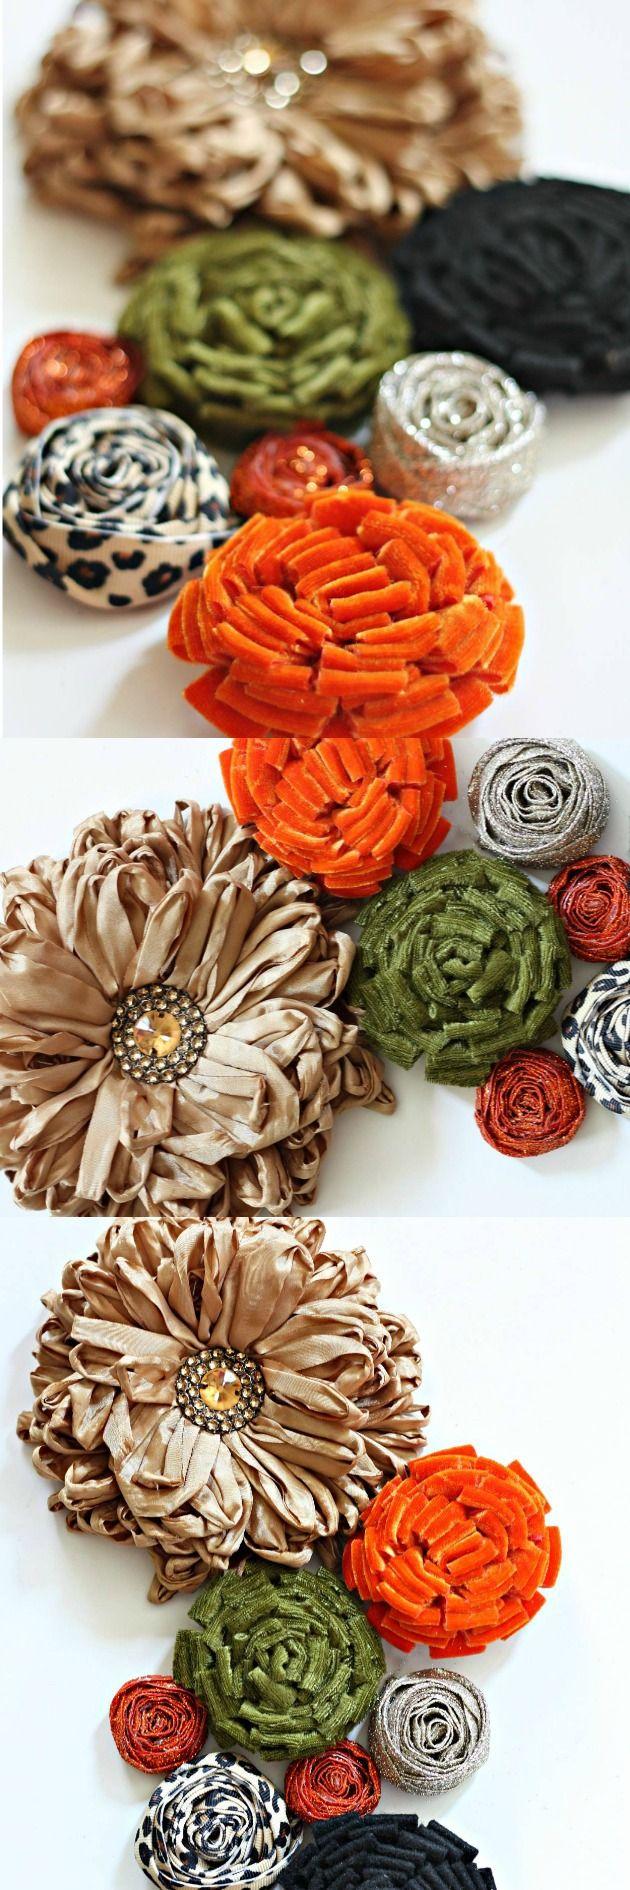 How to make a Posie and Rosette Cluster using Velvet, Felt and Ribbon